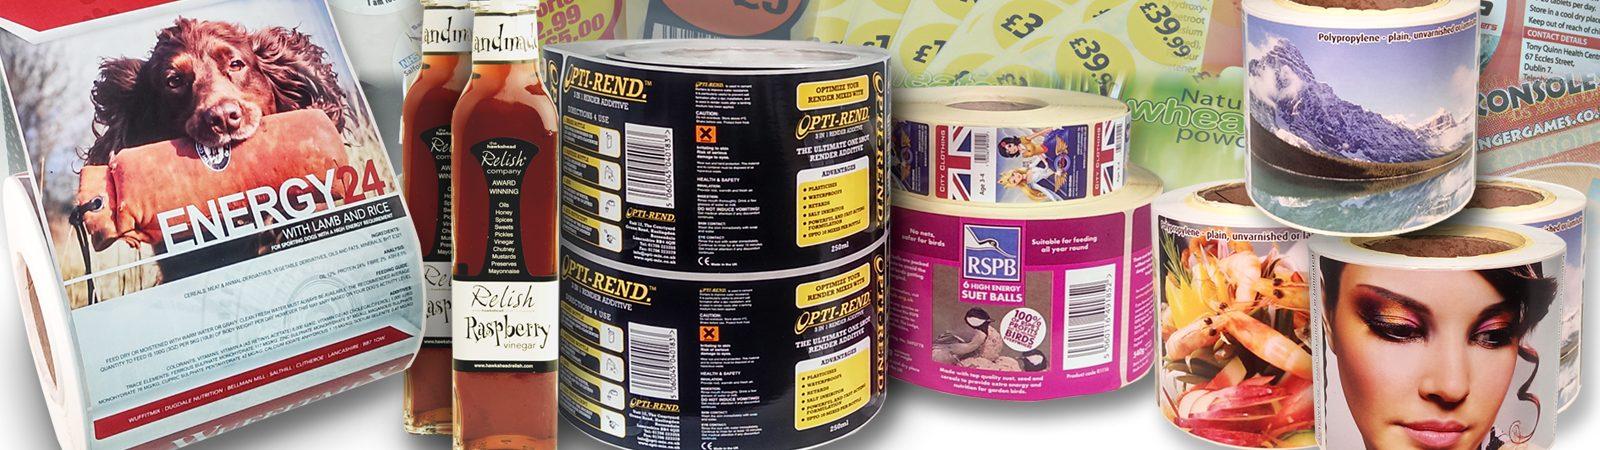 Digital labels, plain labels, glass printed jar, adhesive stickers